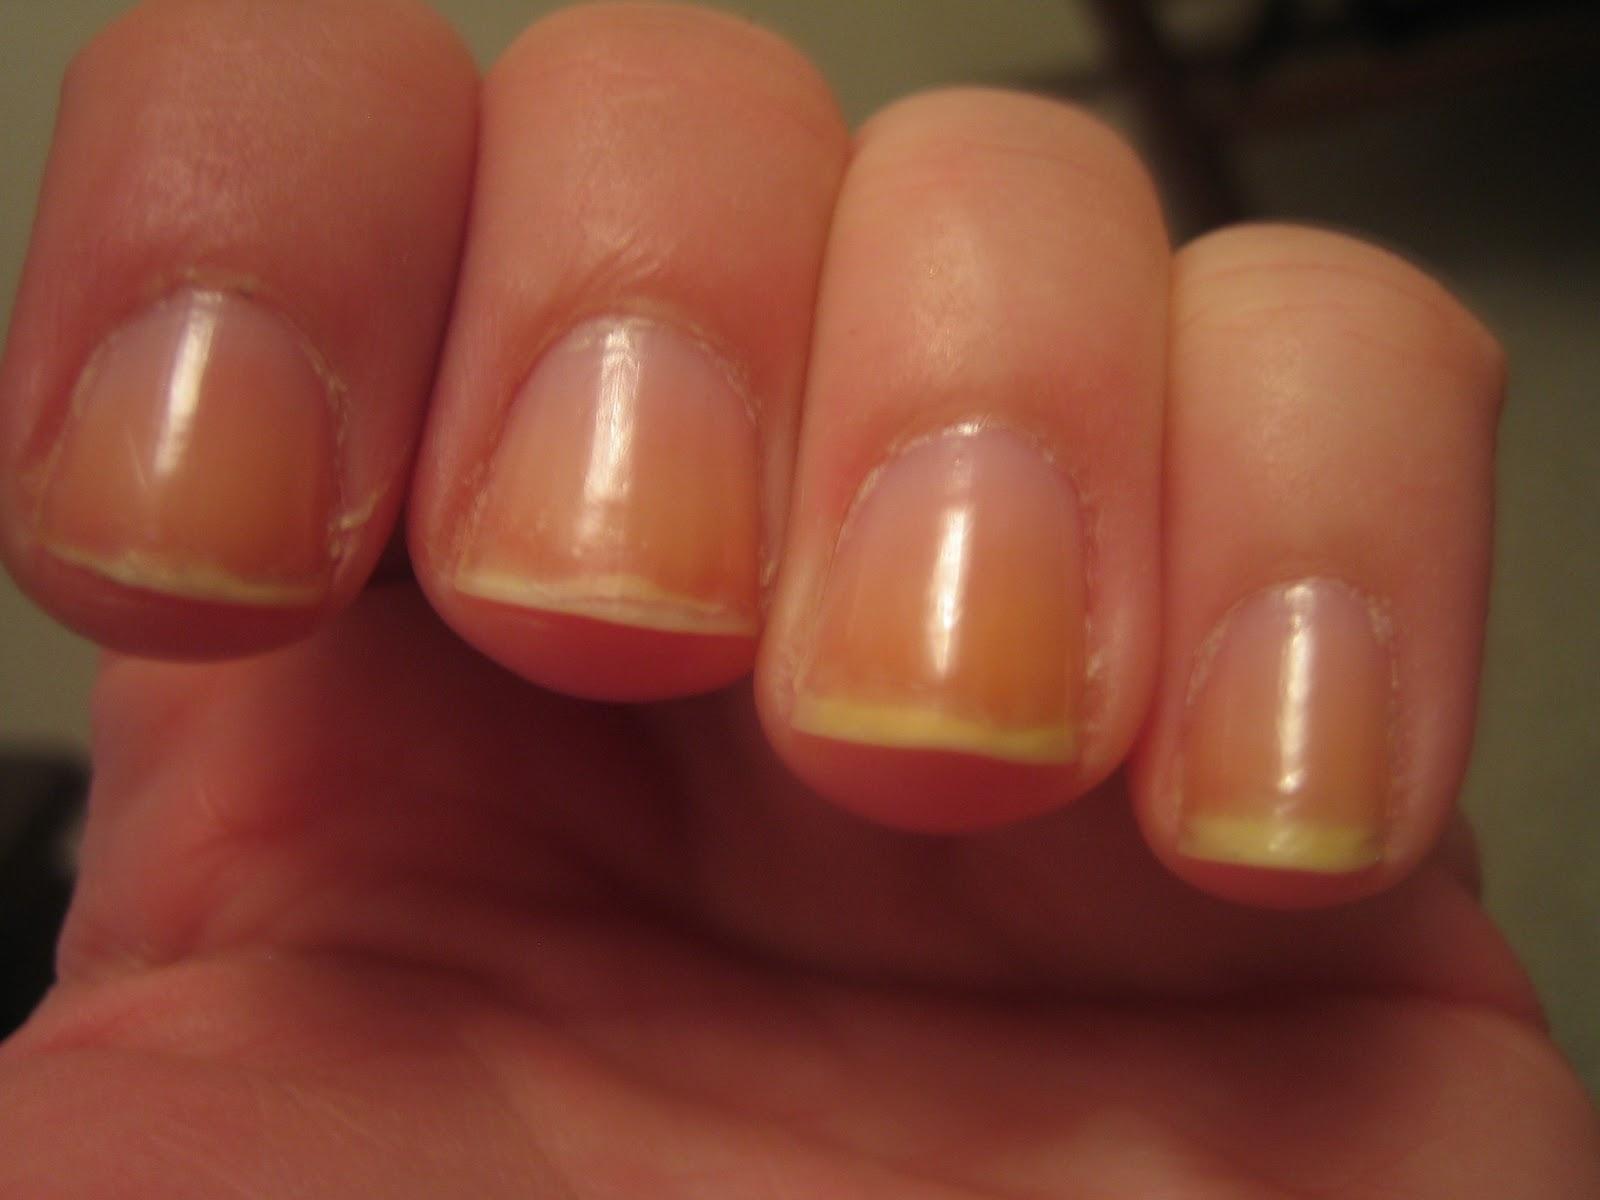 Alikat789 Nail art: My little unpolished broken nails